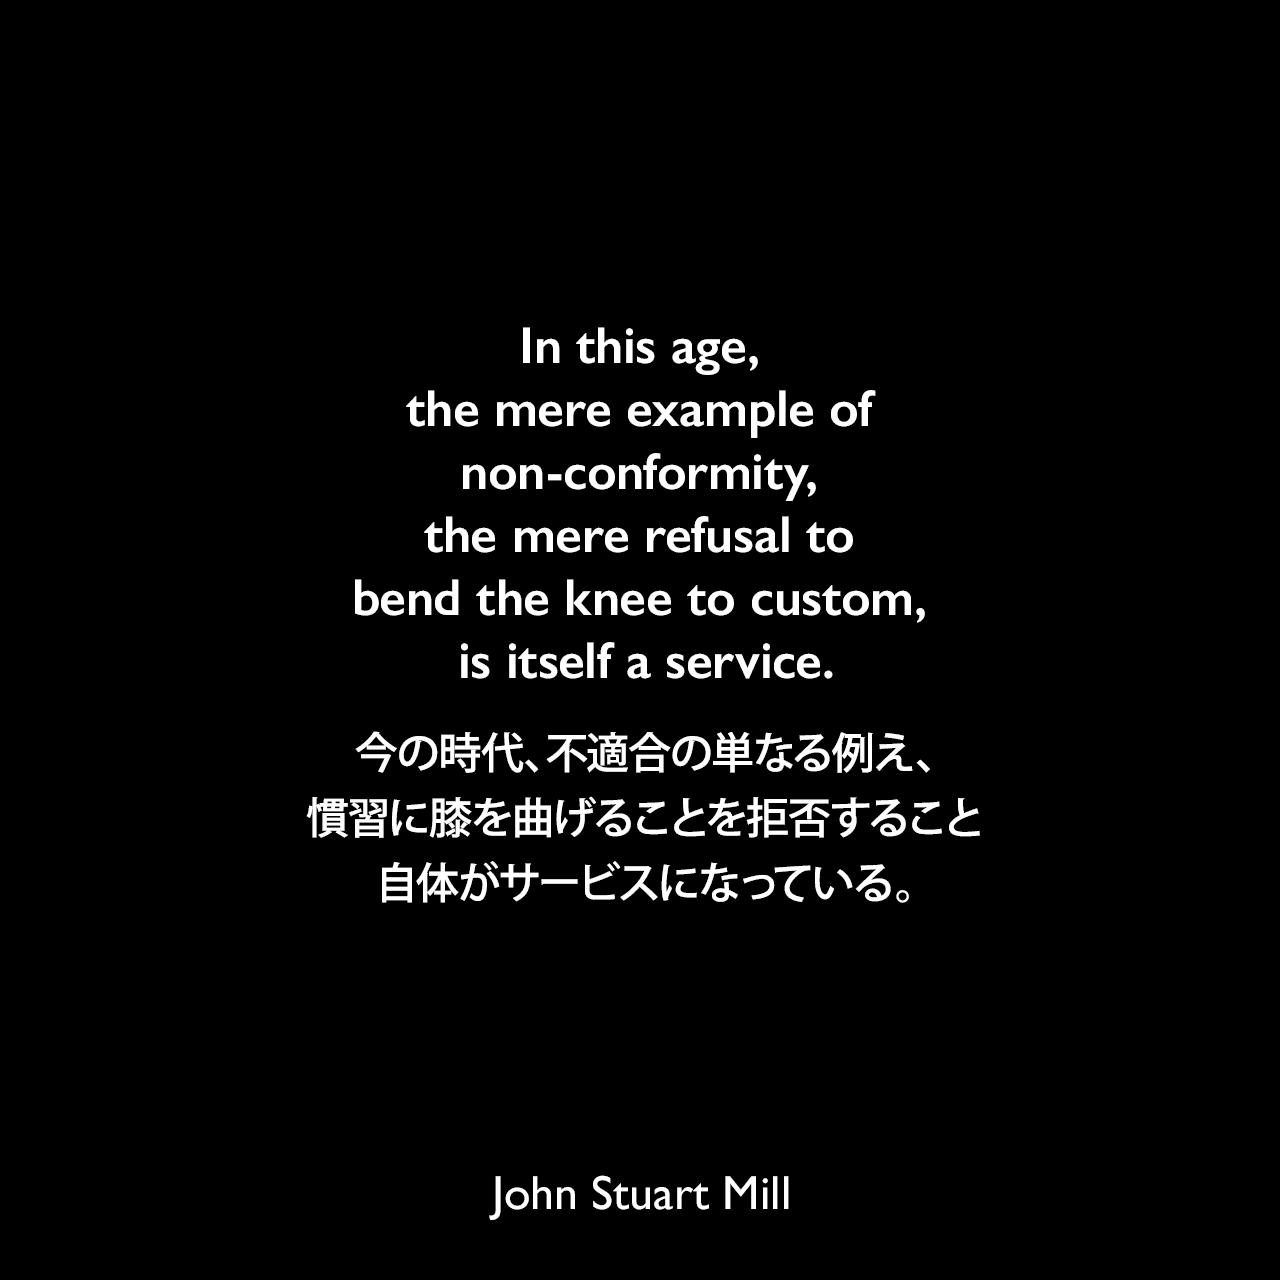 In this age, the mere example of non-conformity, the mere refusal to bend the knee to custom, is itself a service.今の時代、不適合の単なる例え、慣習に膝を曲げることを拒否すること自体がサービスになっている。- ジョン・スチュアート・ミルによる本「自由論」よりJohn Stuart Mill